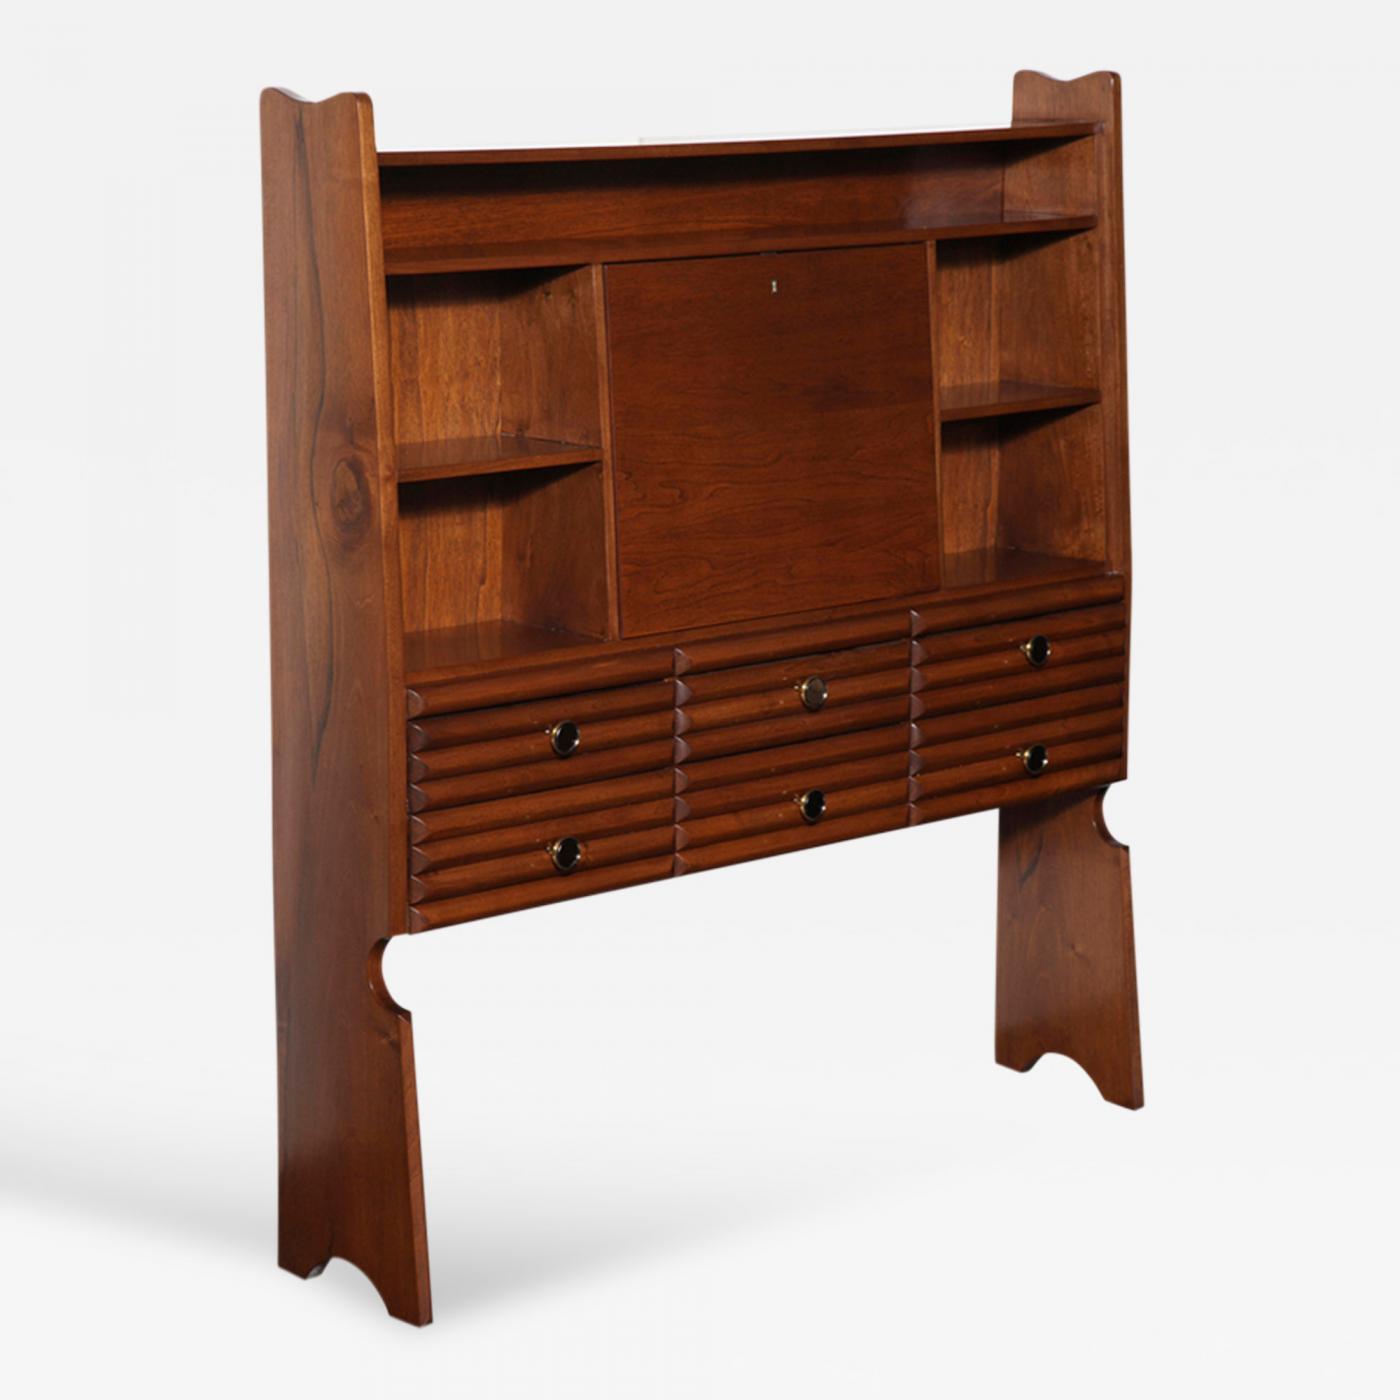 english jacobean barley in secretary drop wonderfull desk orig regarding upscale twist of image front consignment antique